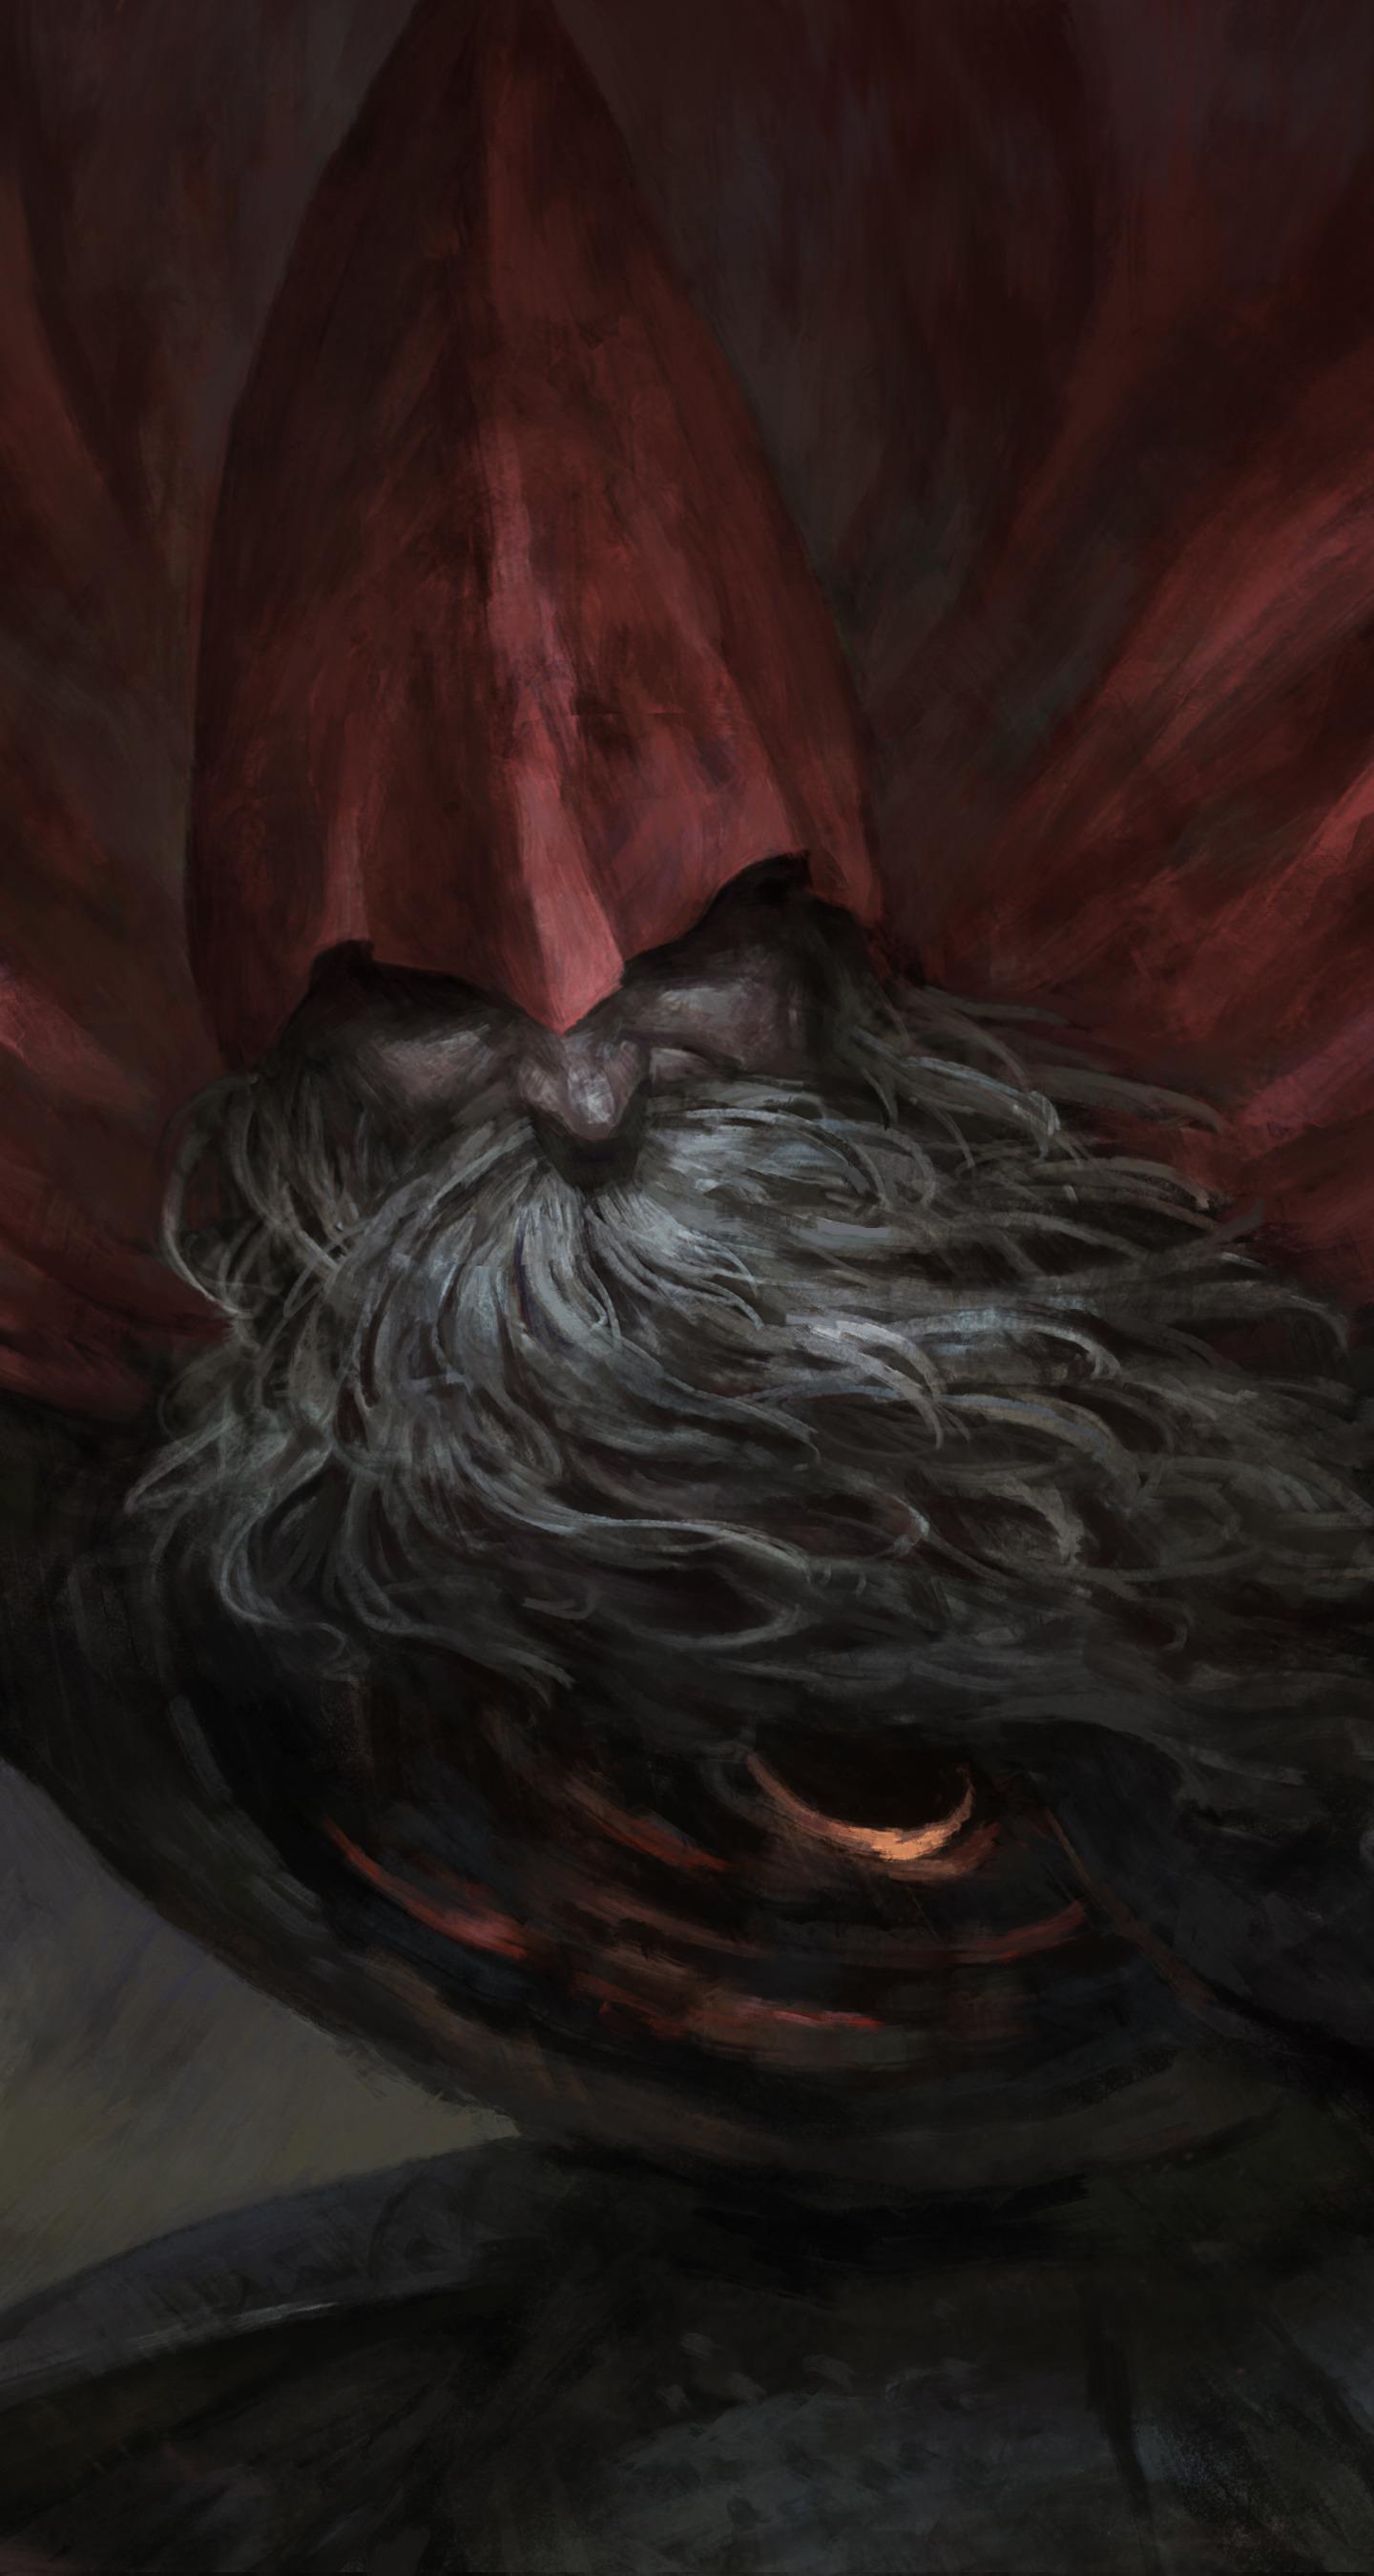 Download 1440x2960 Wallpaper Big Beard Man Warrior Dark Souls